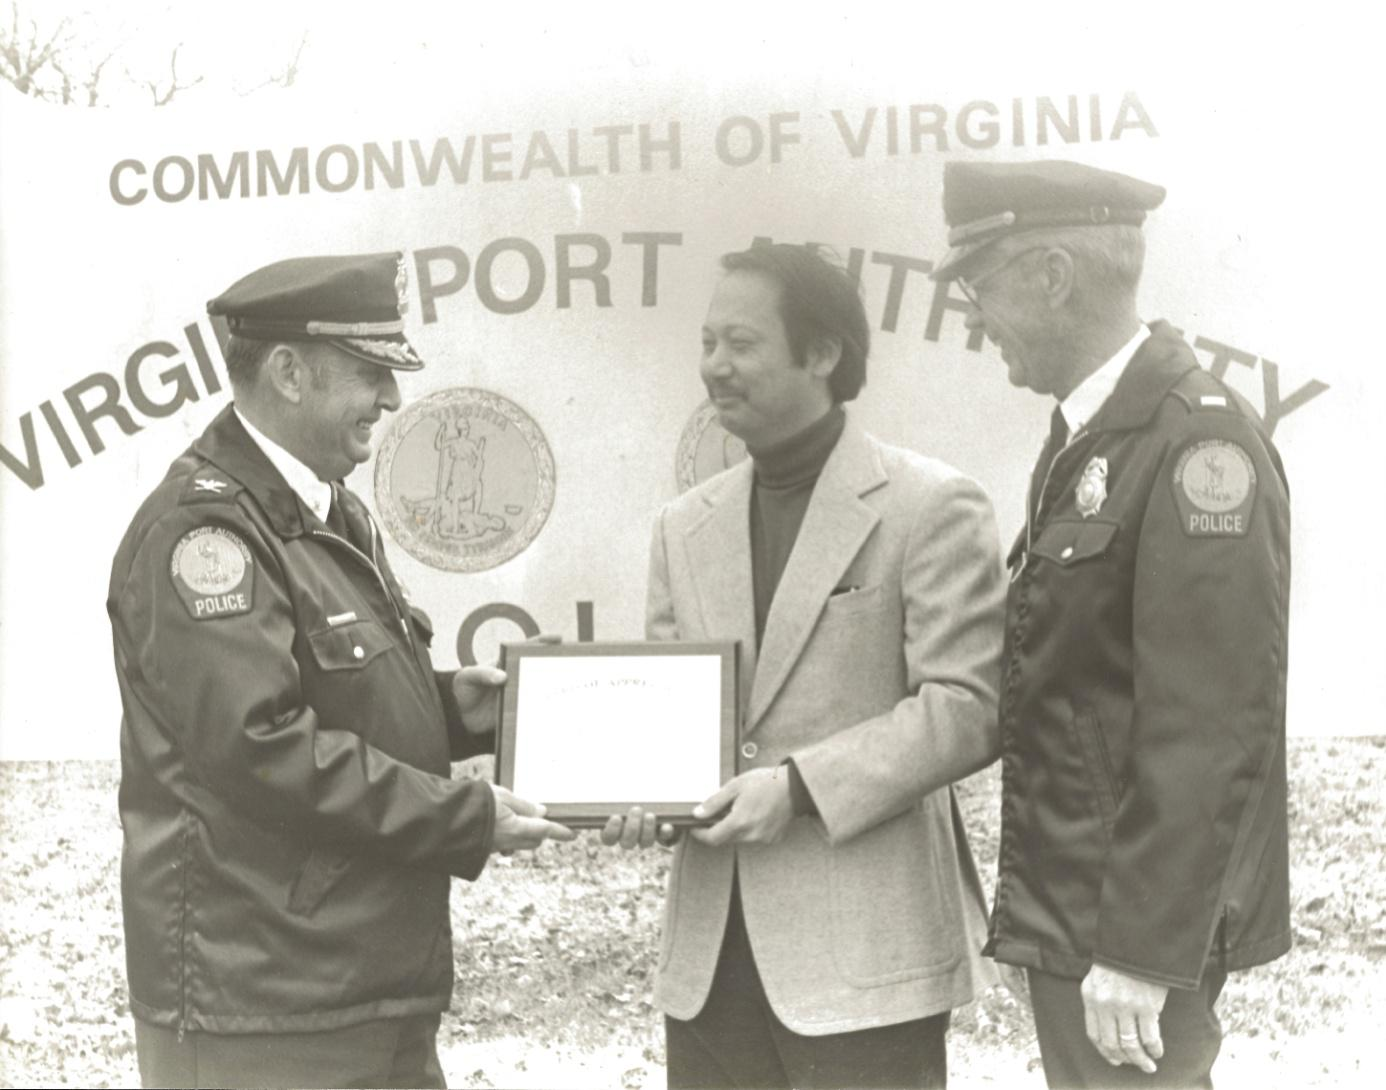 Chief Collier, Virginia Port Authority